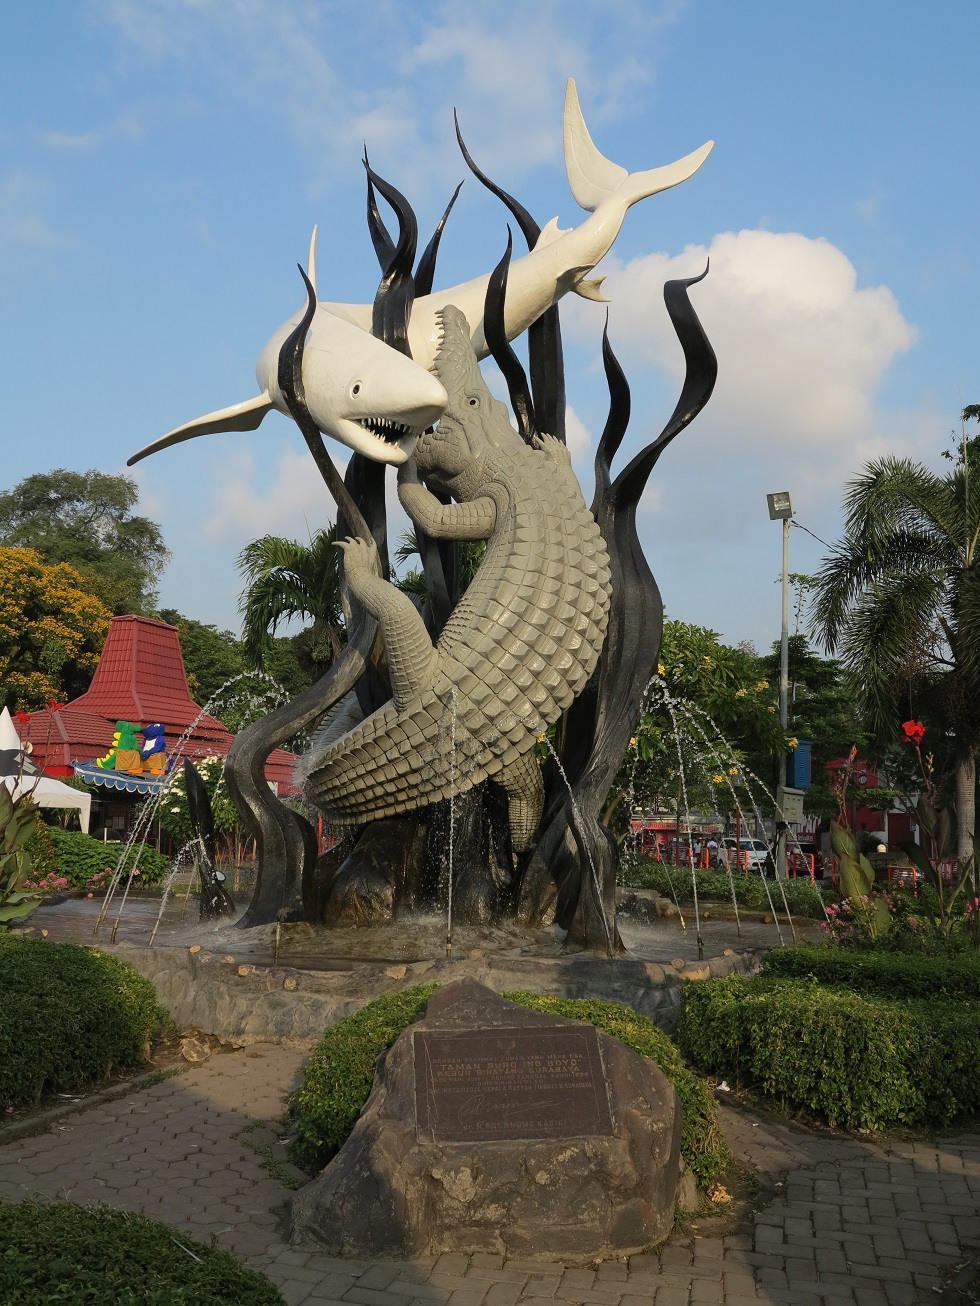 Daftar Alamat Tempat SPA dan Panti Pijat di Surabaya